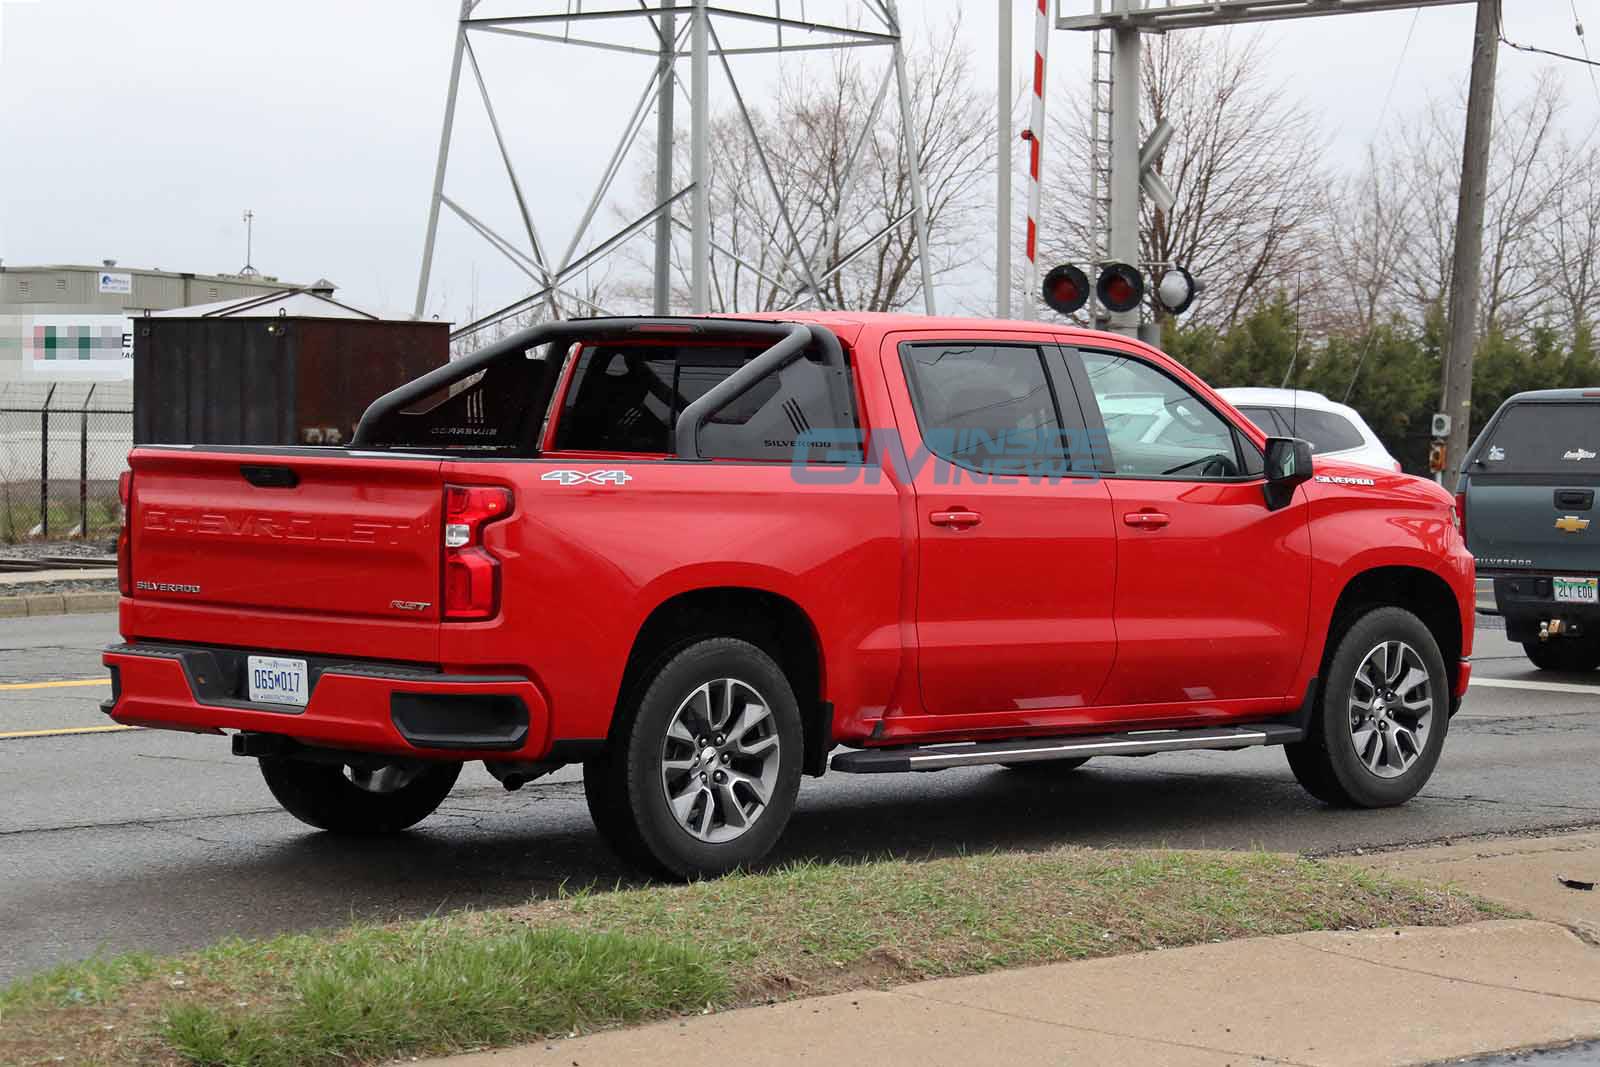 Gallery: 2019 Chevrolet Silverado Getting an RST Model ...